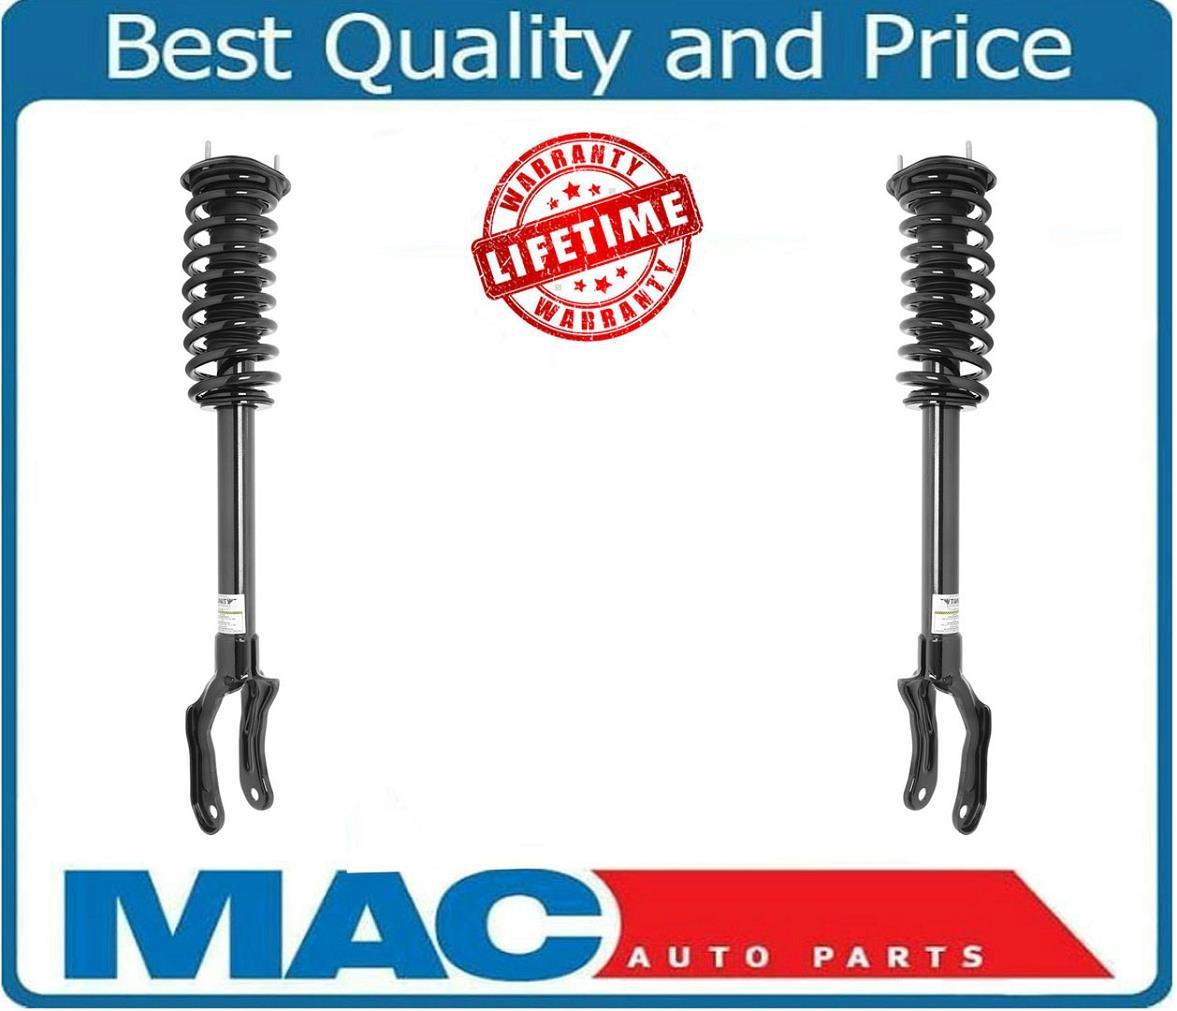 Mac Auto Parts Rear Shock Absorbers /& Upper Shocks Mounts Fits Jeep Grand Cherokee 2011-2015